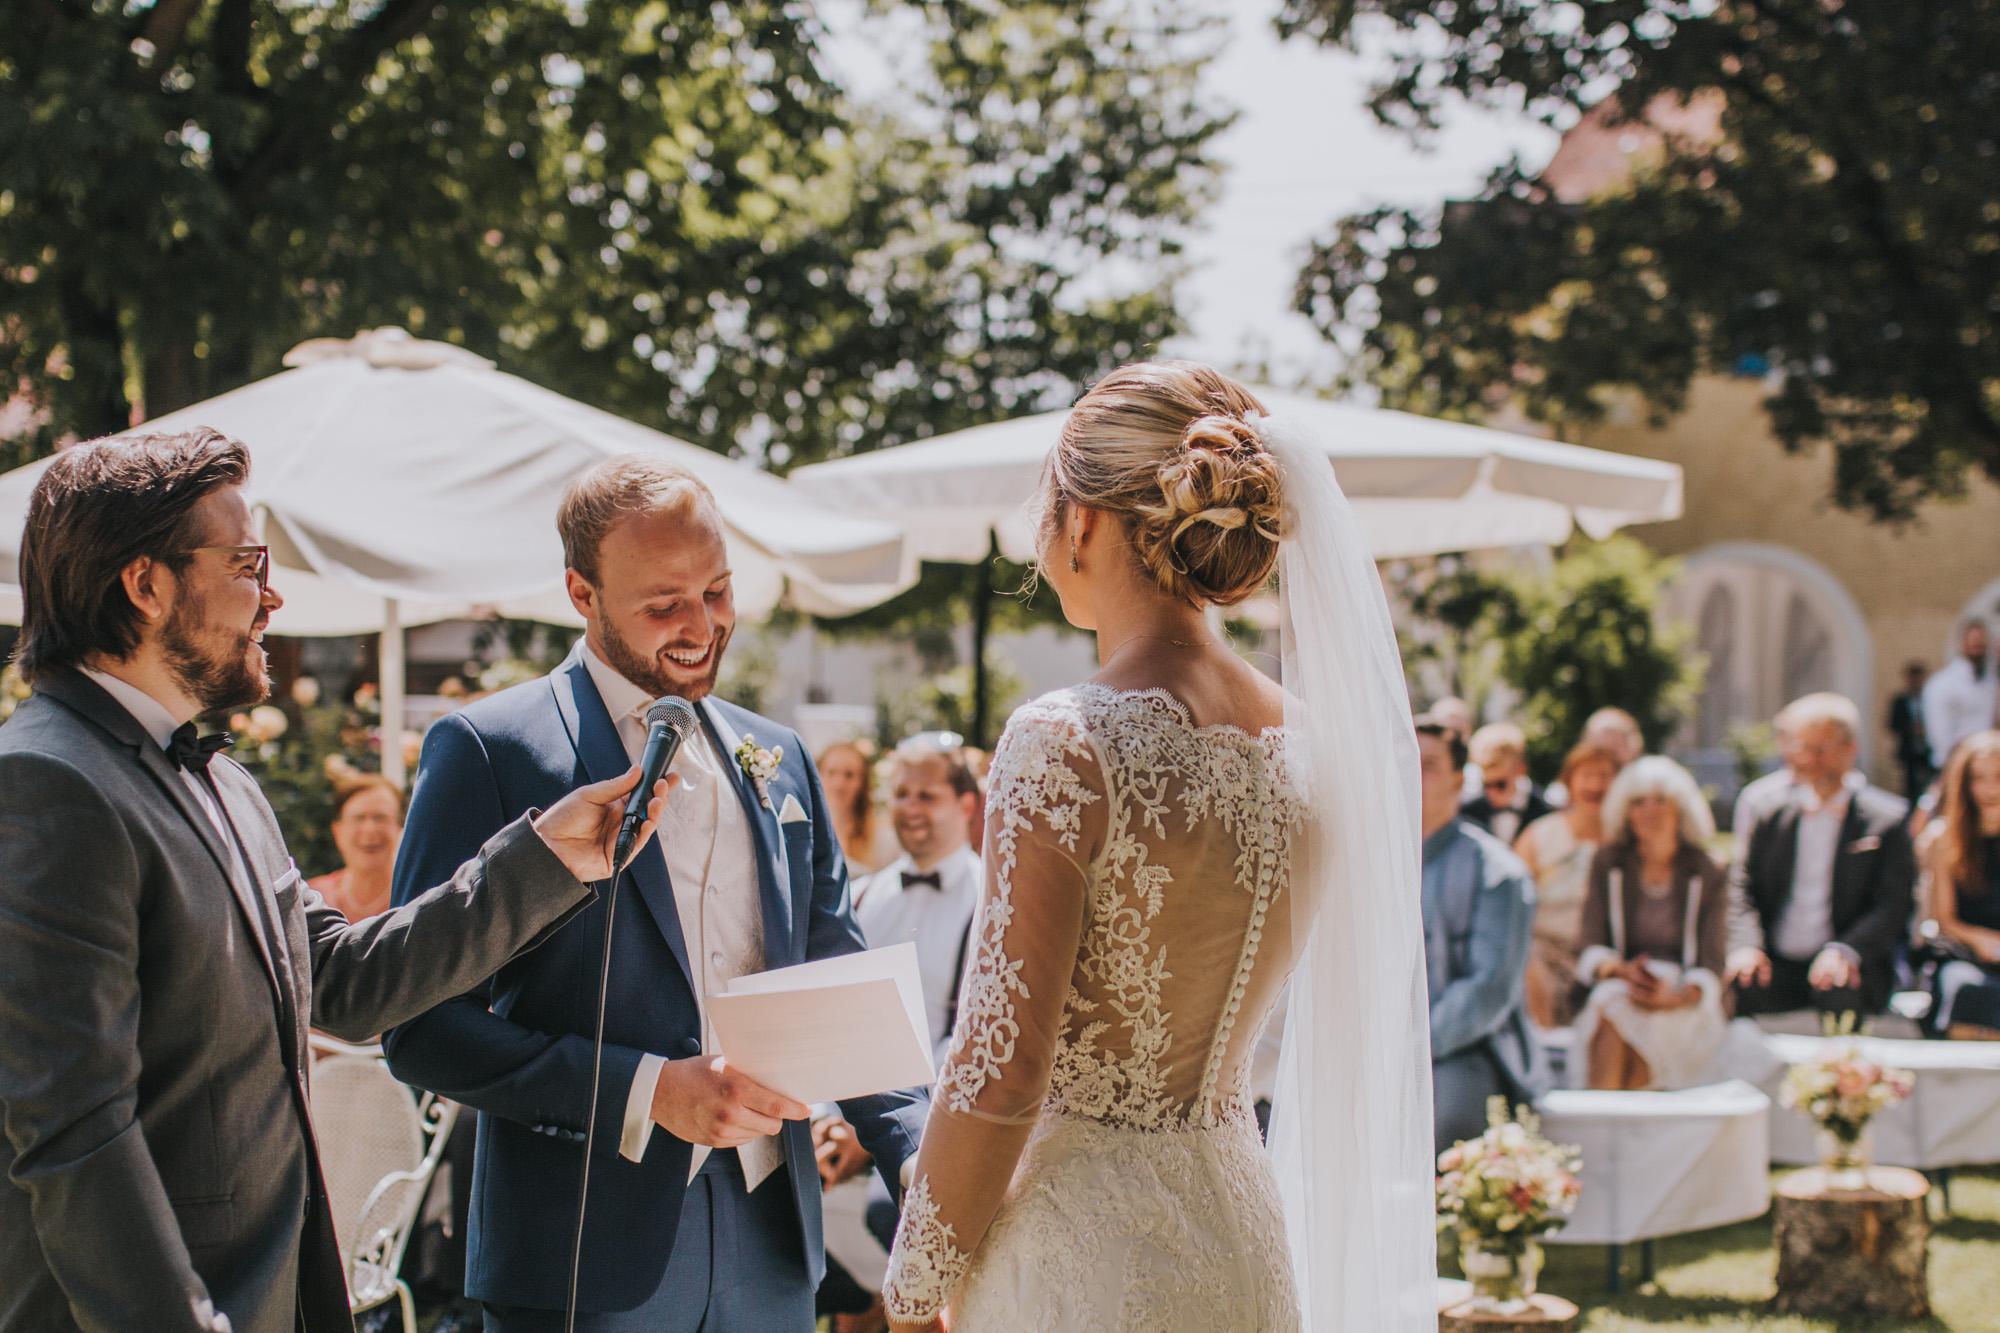 Hochzeit - Memory factory - 20180616-0028.jpg